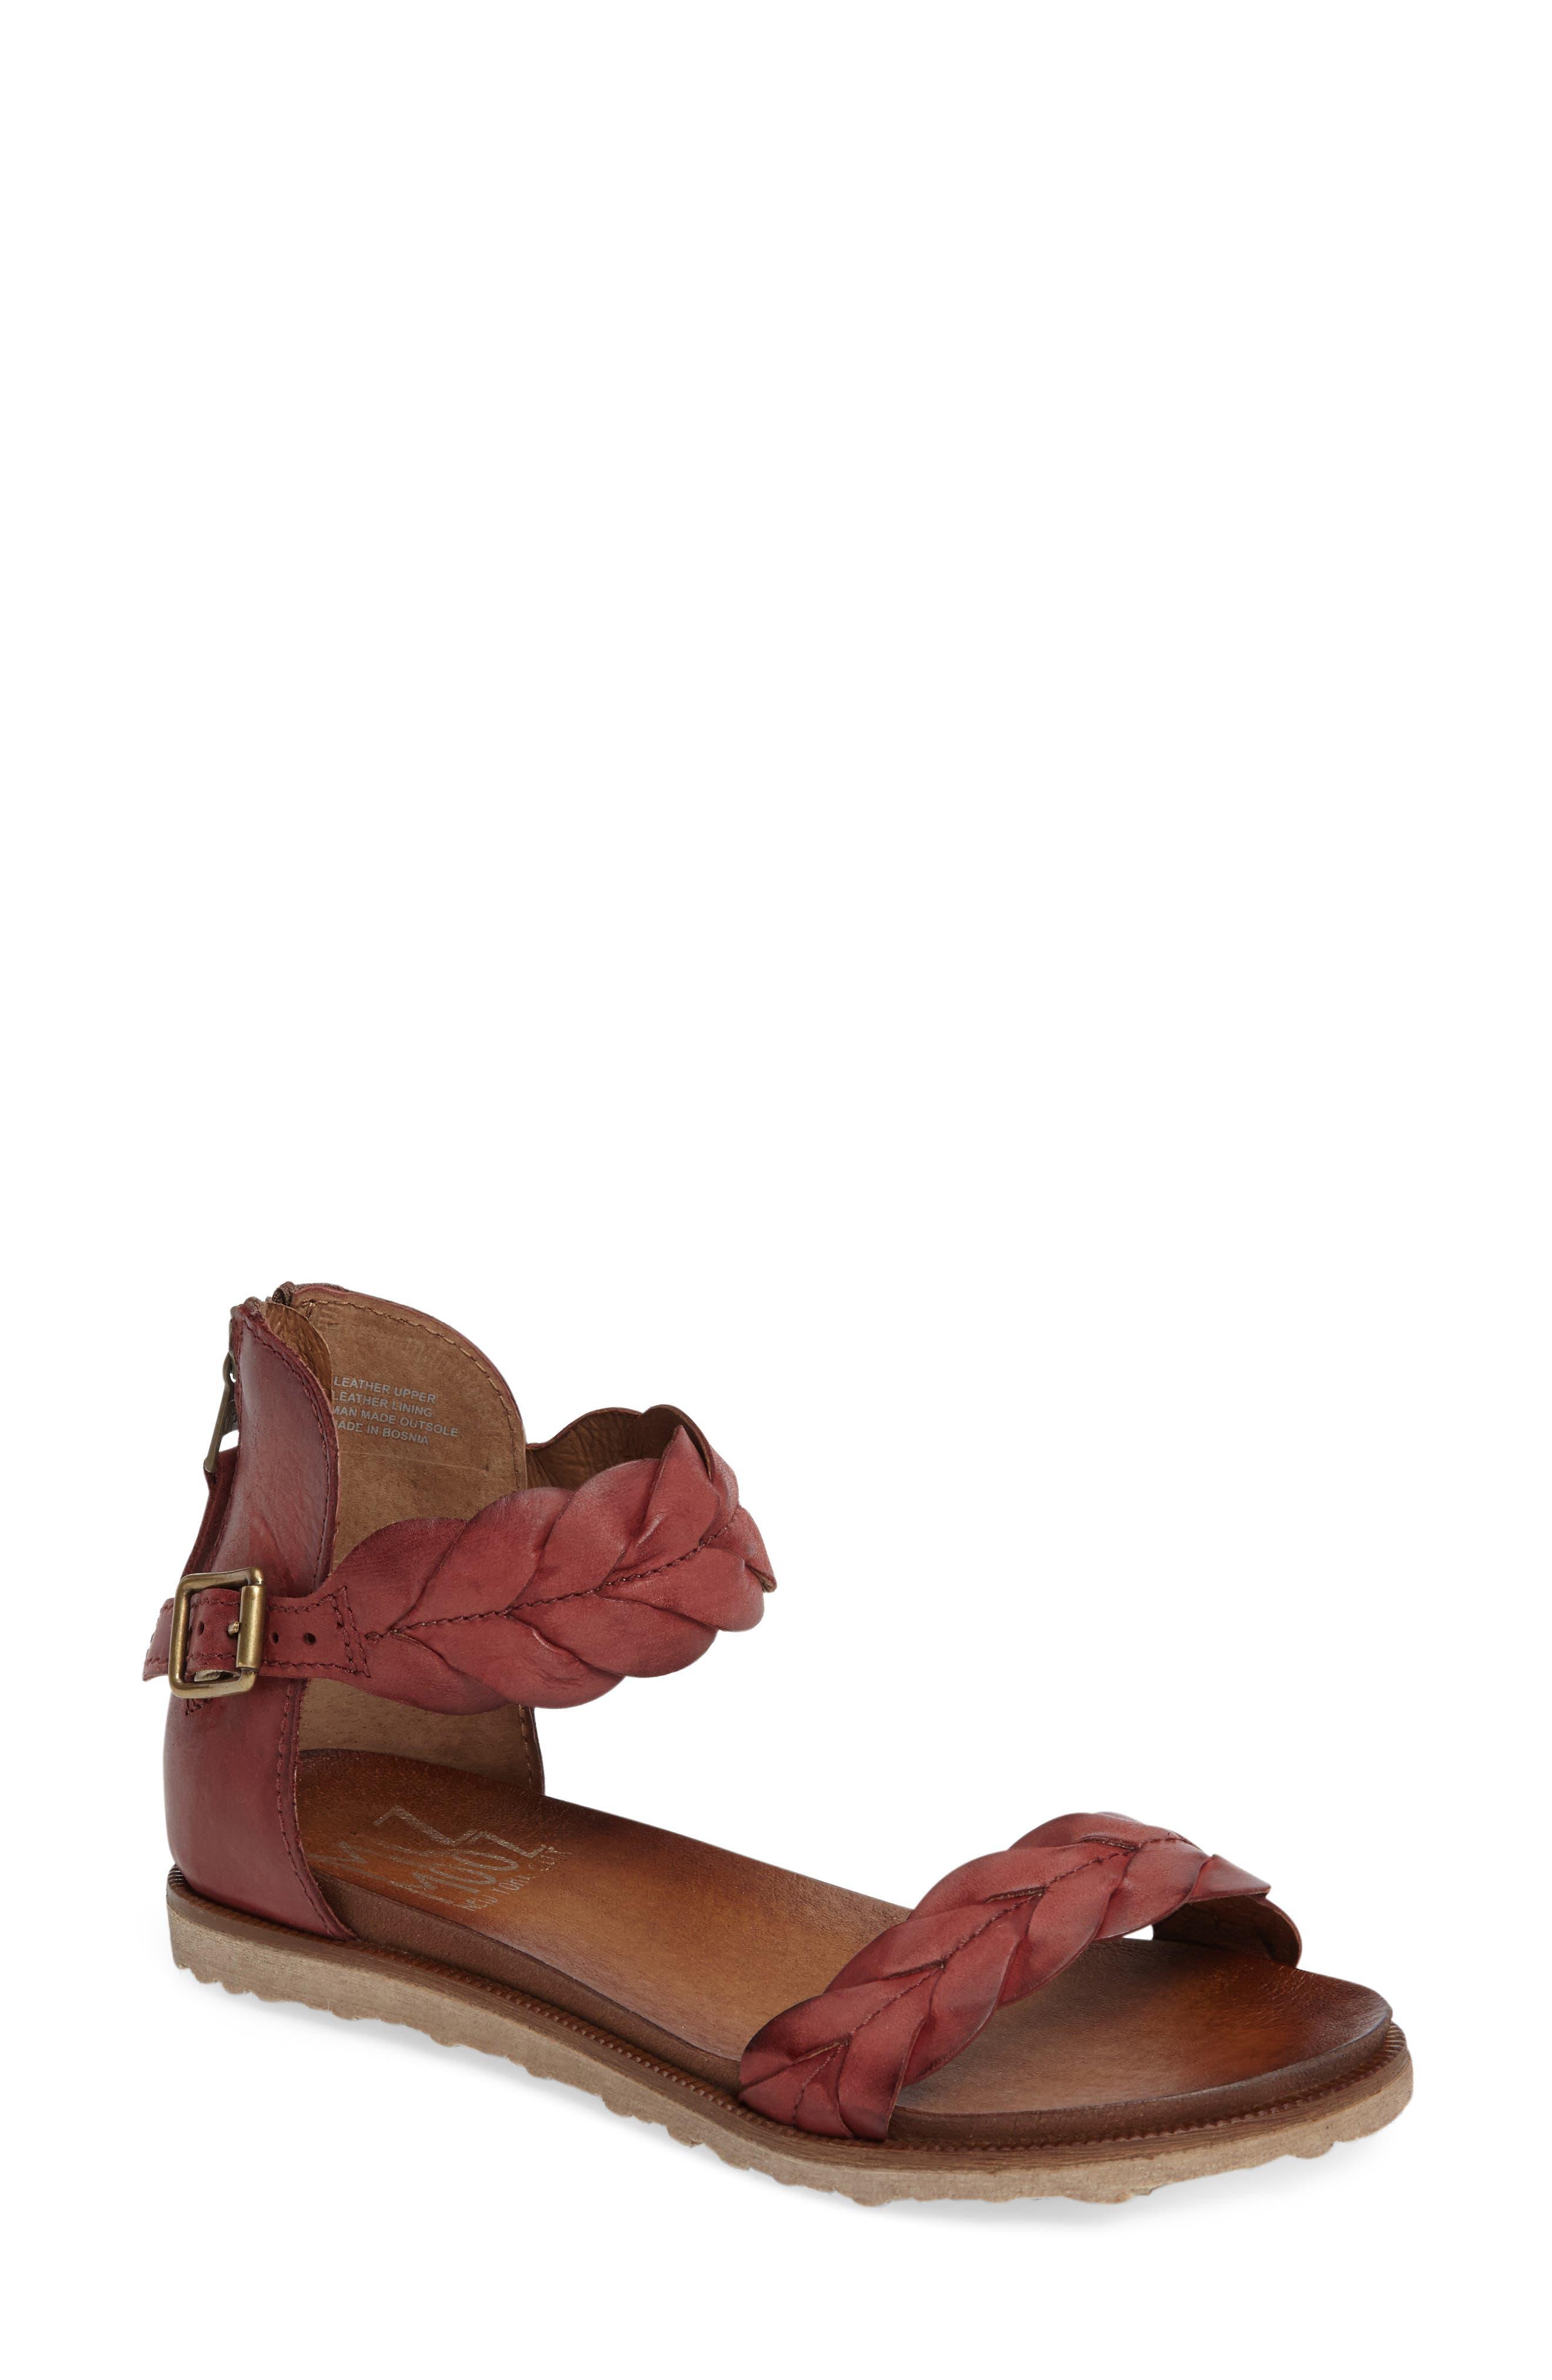 Miz Mooz Taft Sandal (Women)